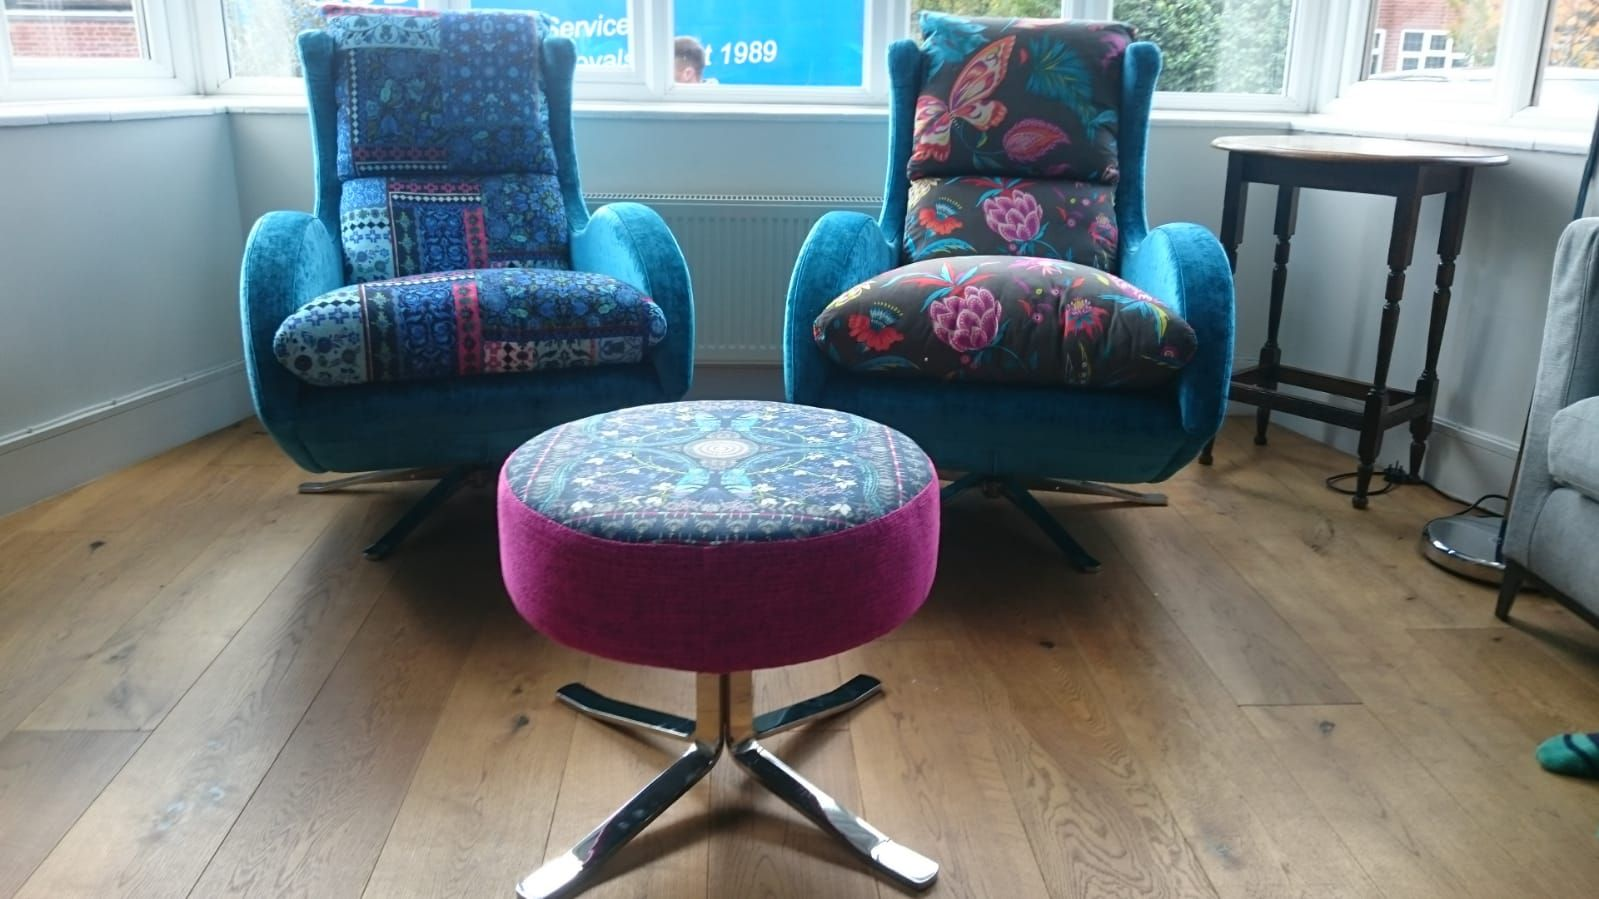 Chrome based swivel tilt designer chairs with one shared